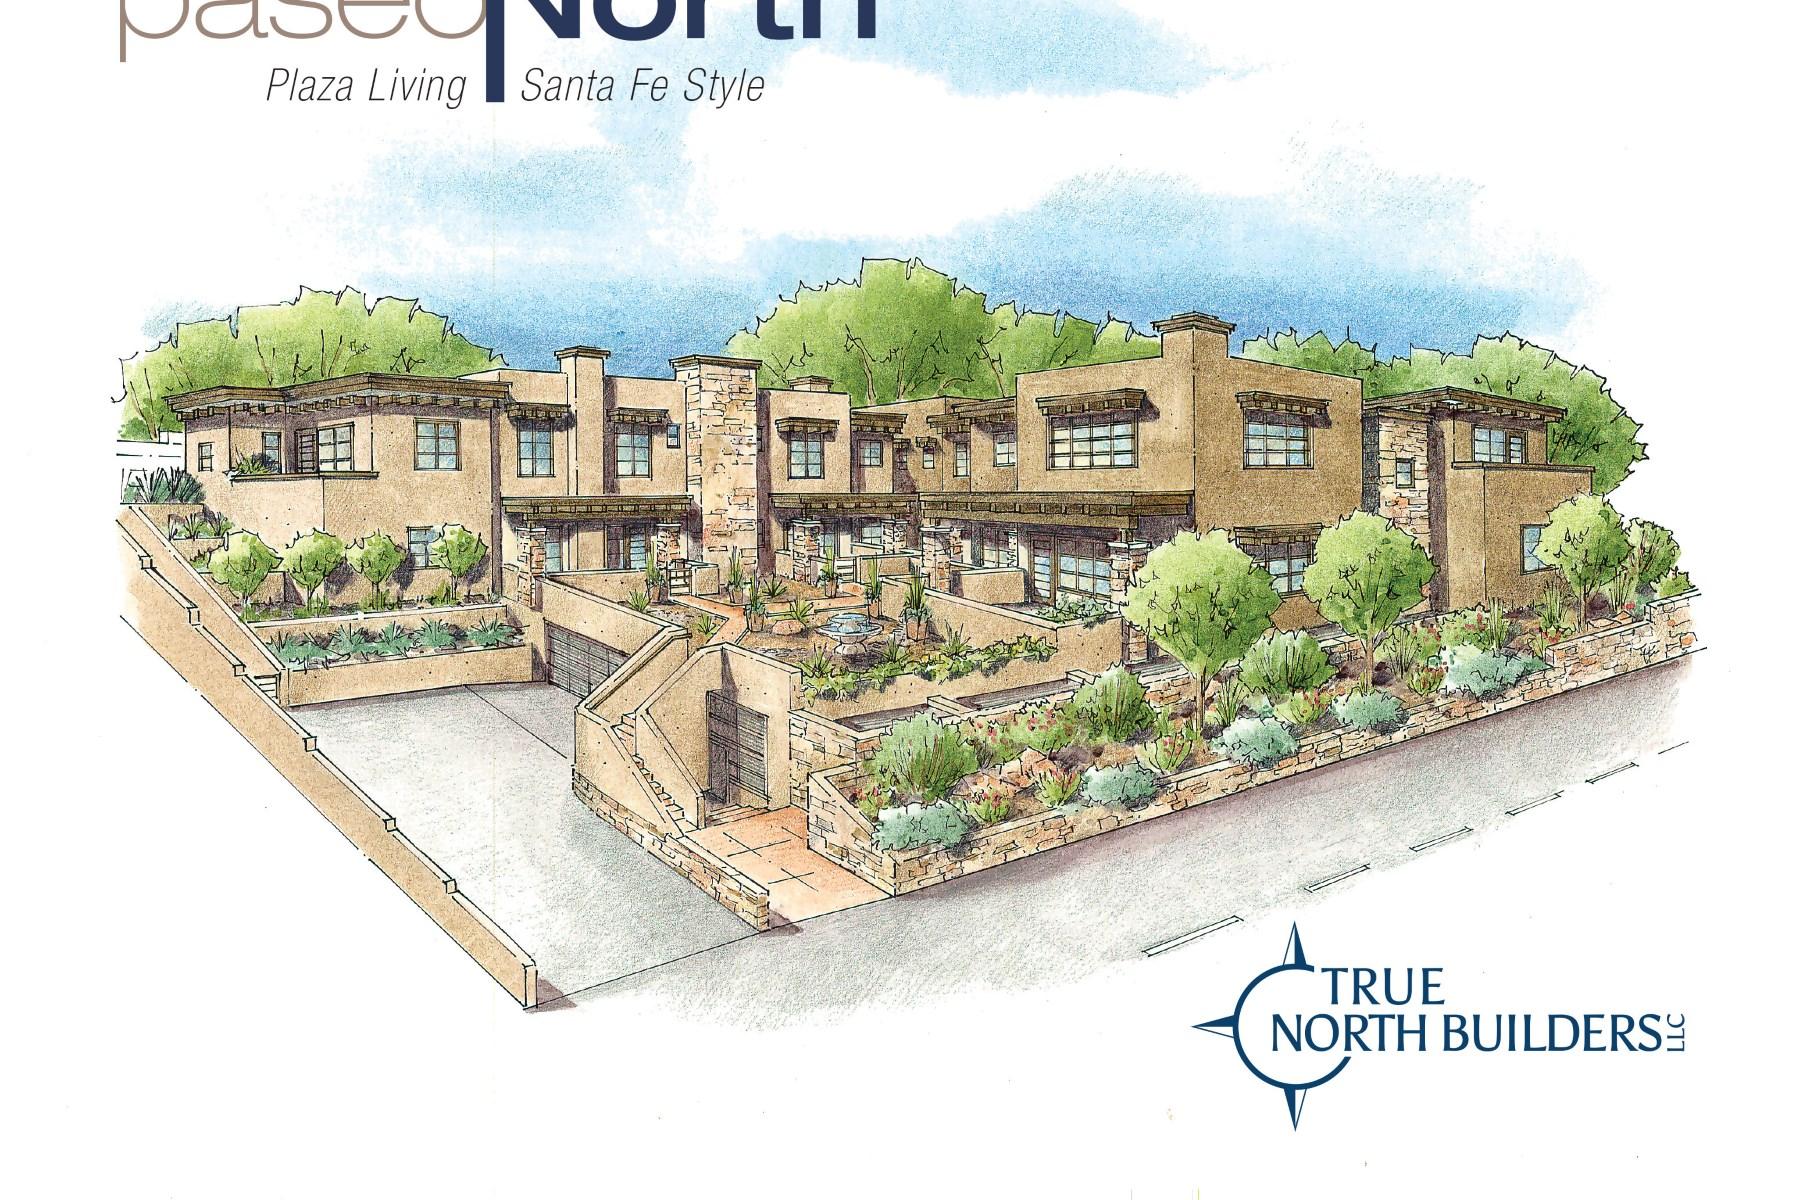 Condominium for Sale at 511 Paseo De Peralta #4 Santa Fe City Northeast, Santa Fe, New Mexico 87501 United States